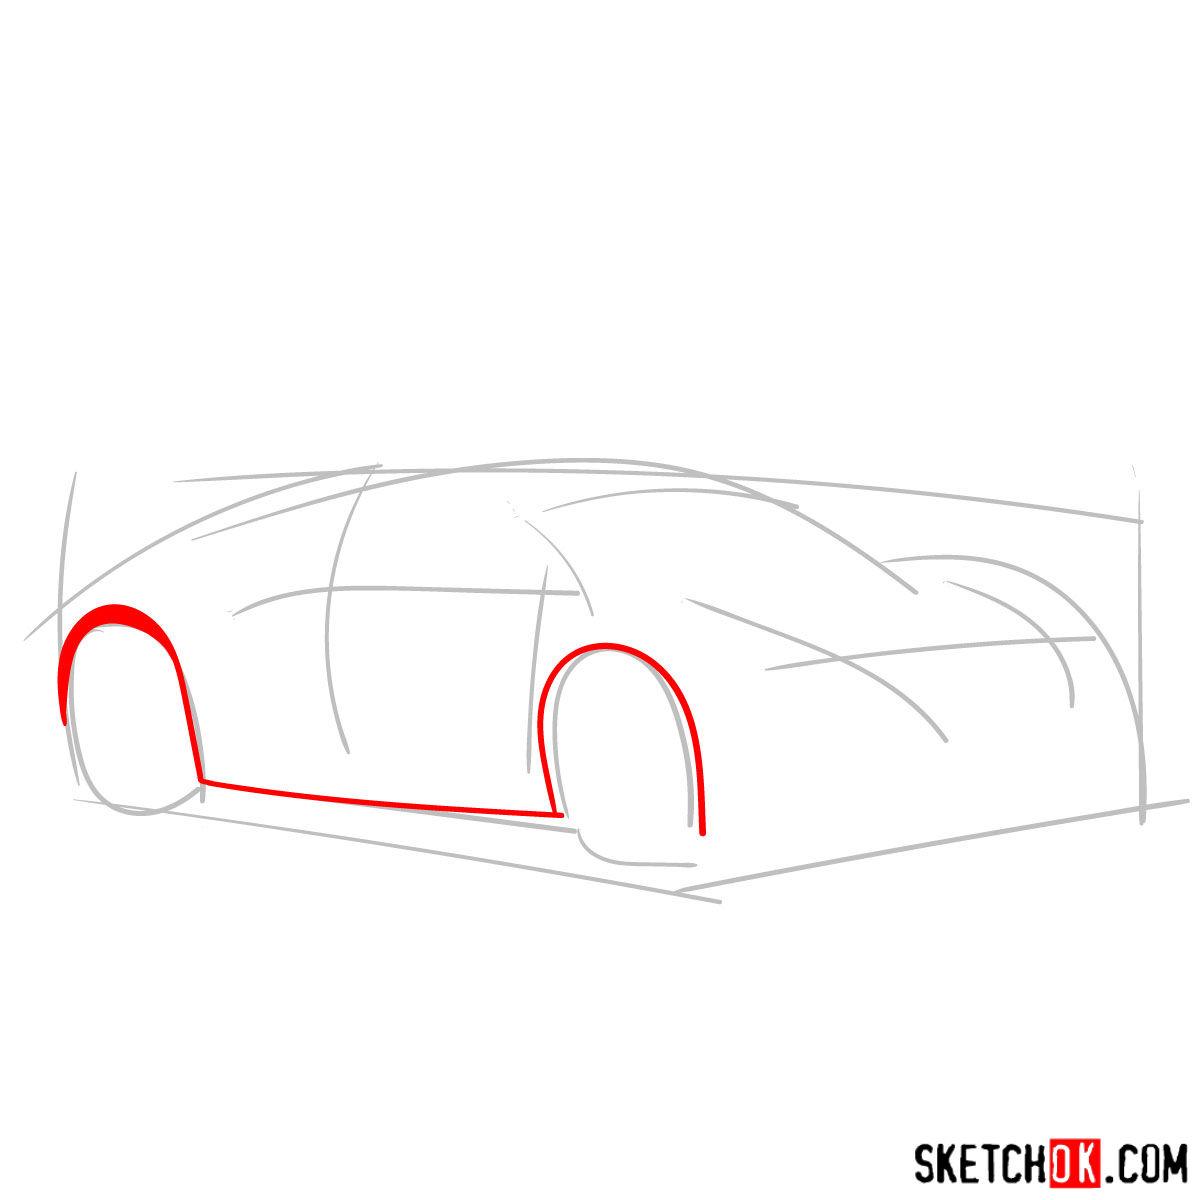 How to draw Bugatti Veyron 16.4 Super Sport - step 02